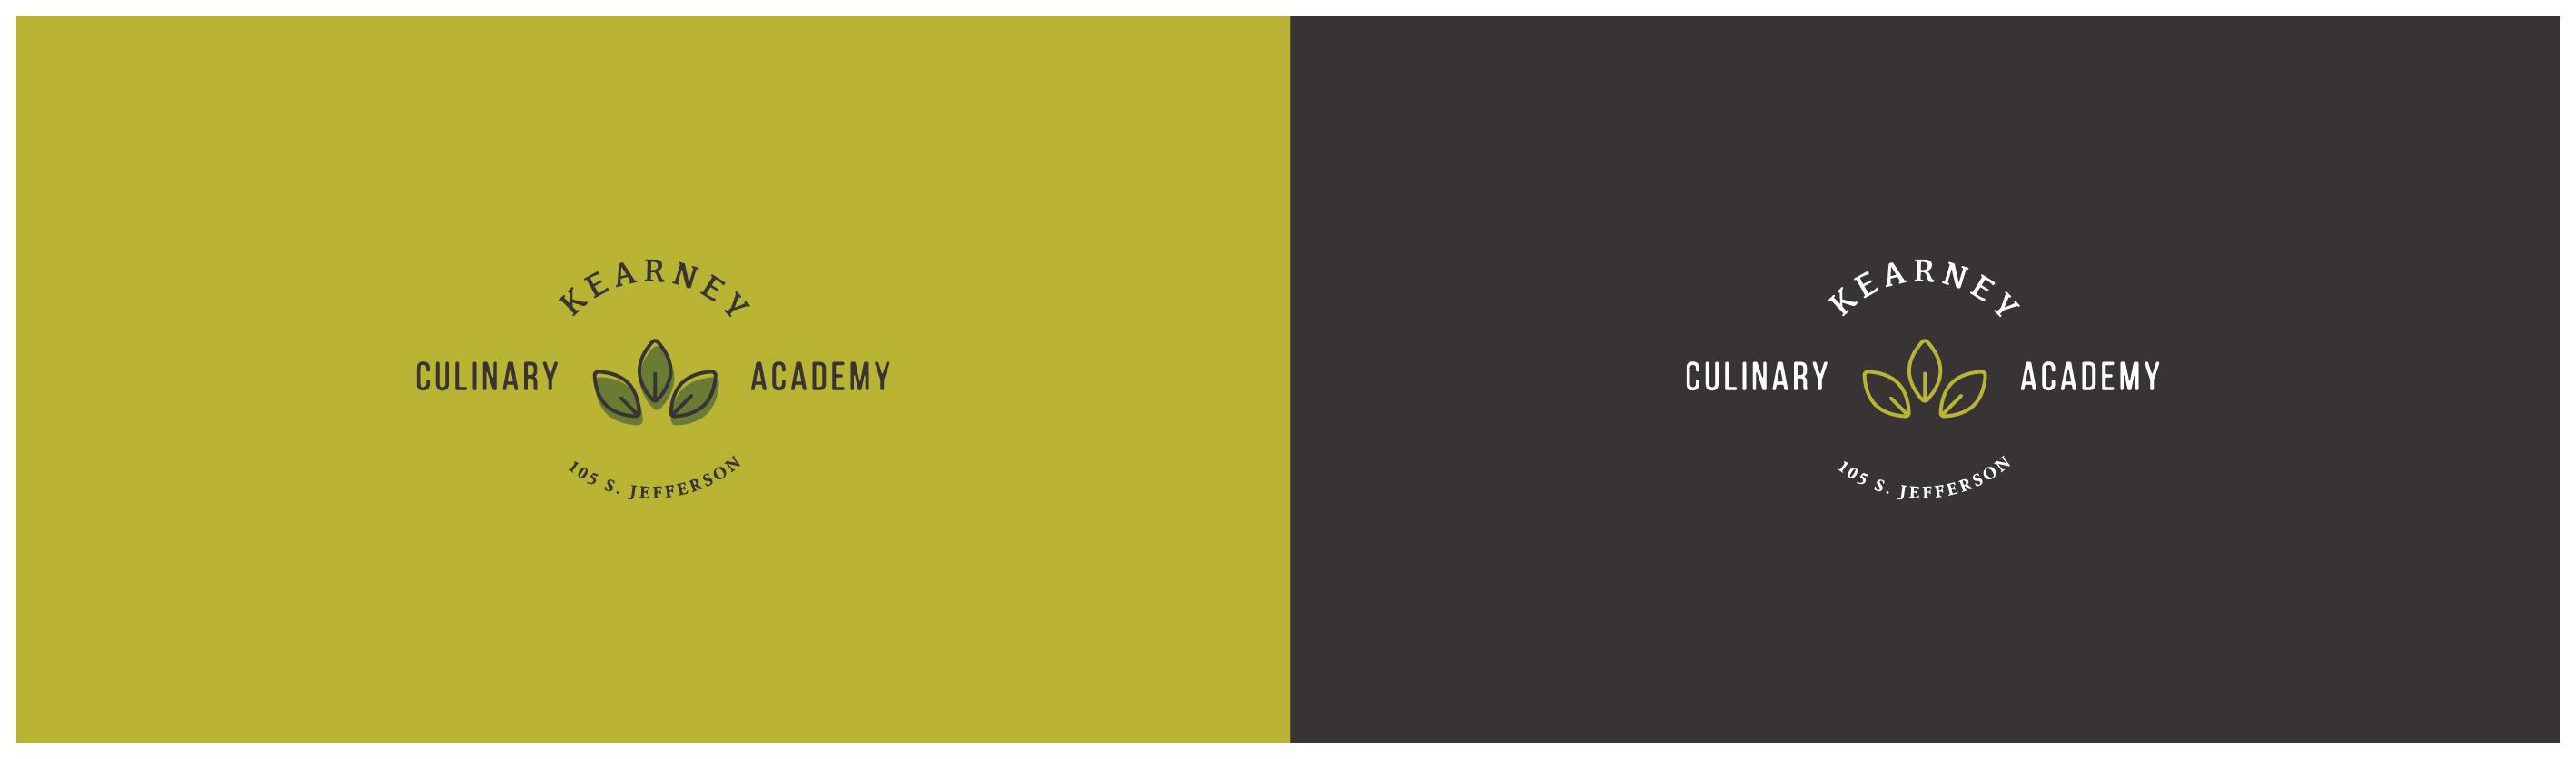 Kearney Culinary Academy Primary logo design - alternates